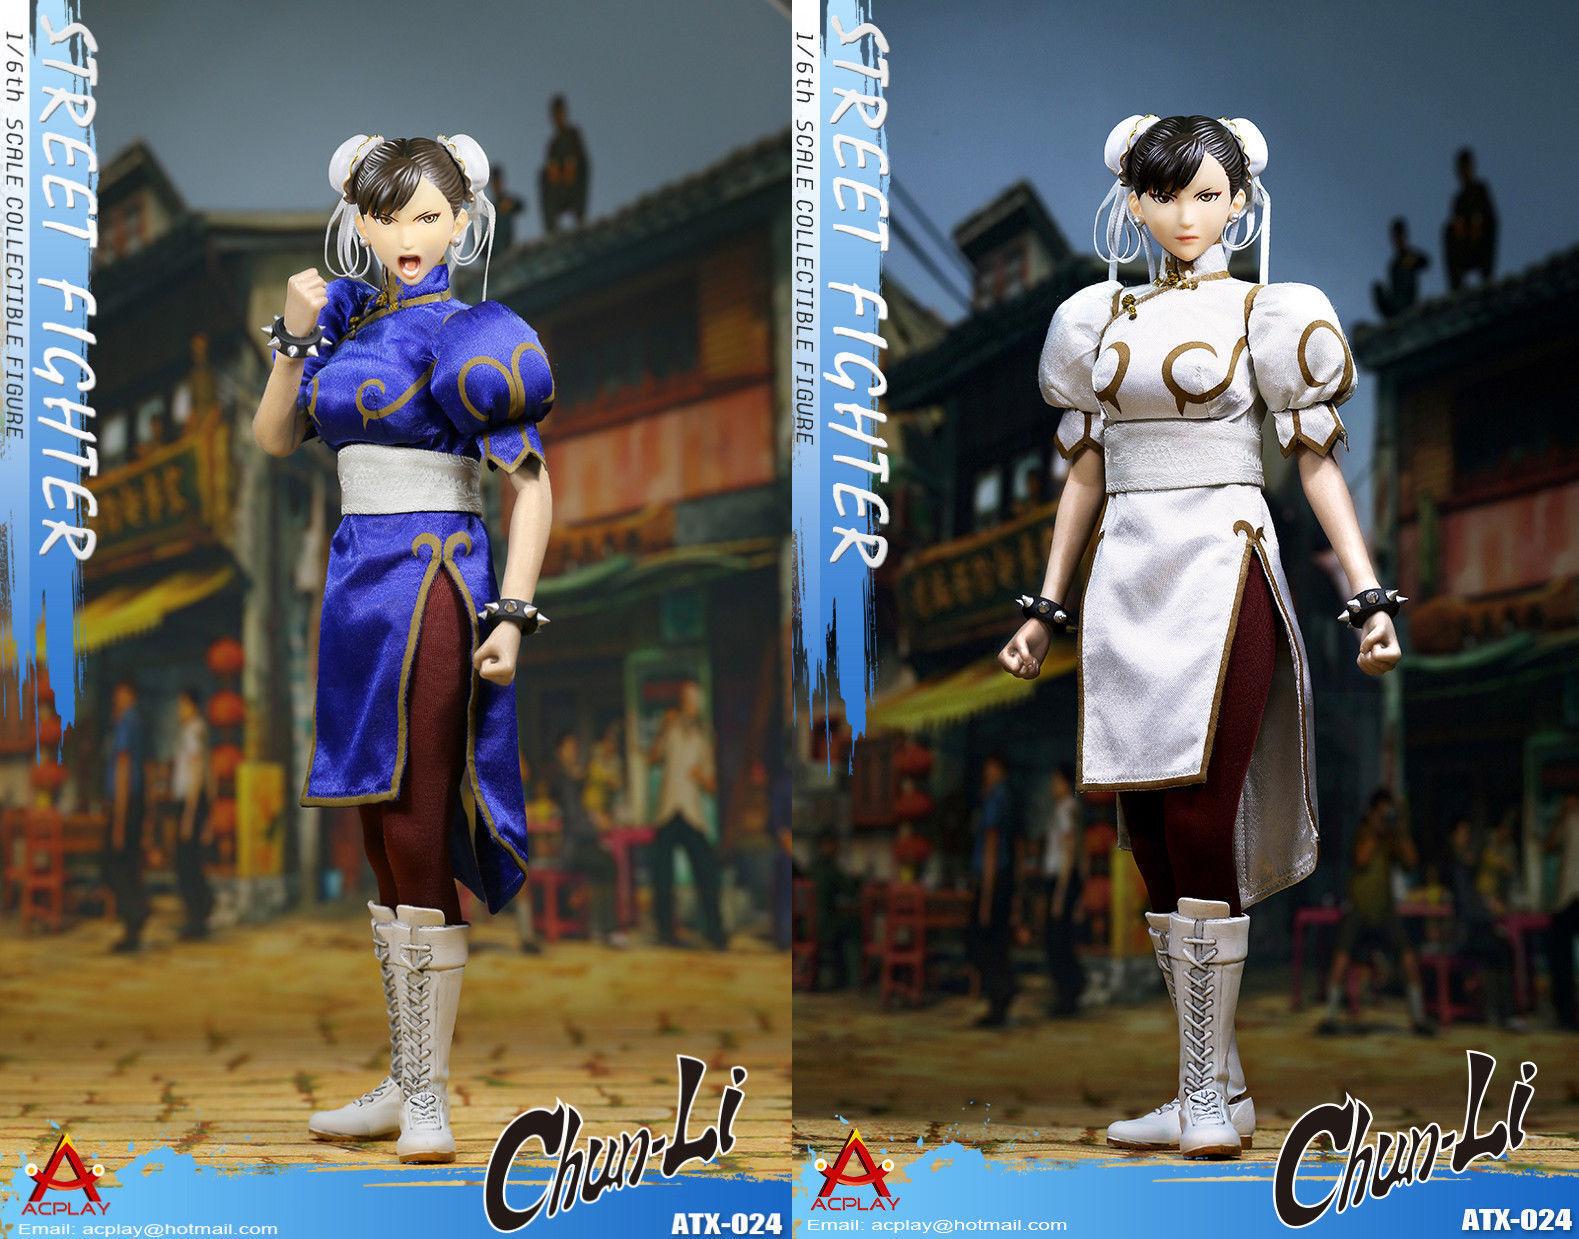 HOT FIGURE TOYS ACPLAY 1 6 ATX024 Street fighter Chun Li Double brow and dress